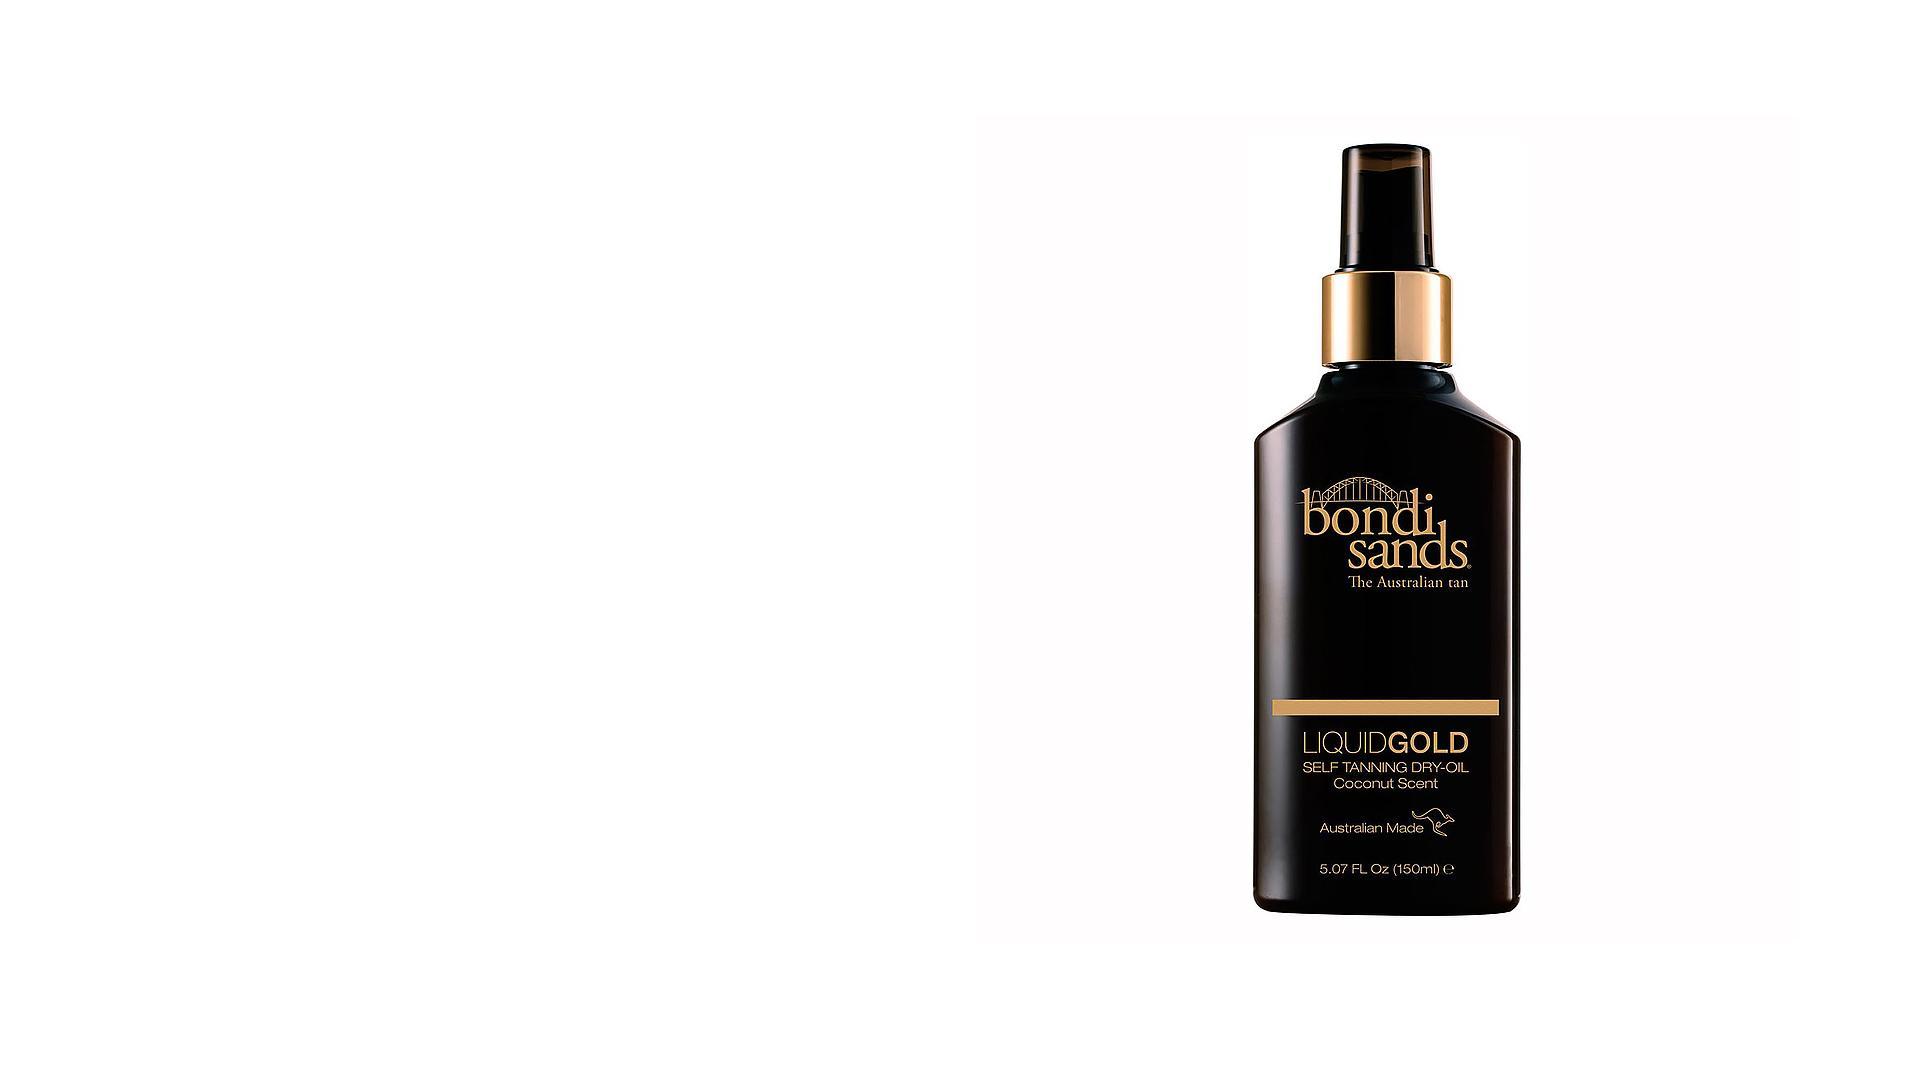 Liquid Gold Self Tanning Oil - HelloOctoberXo - Drugstore Make Up Hype